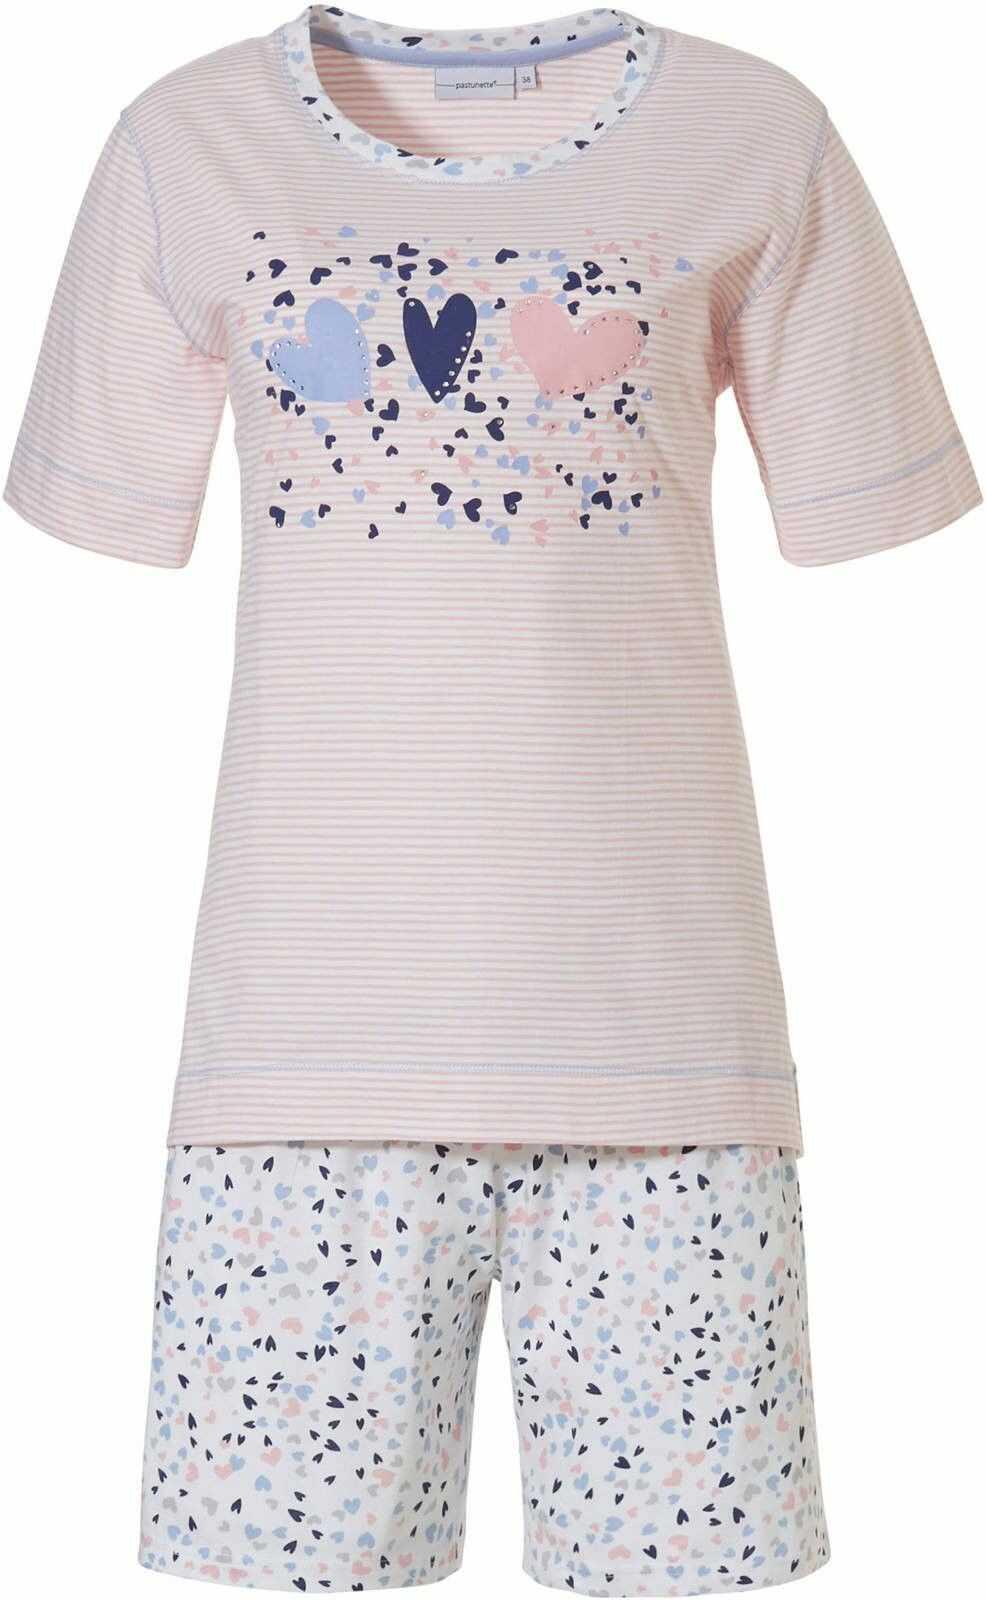 Pastunette Sweerheart piżama 30211-116-2 kolor 206